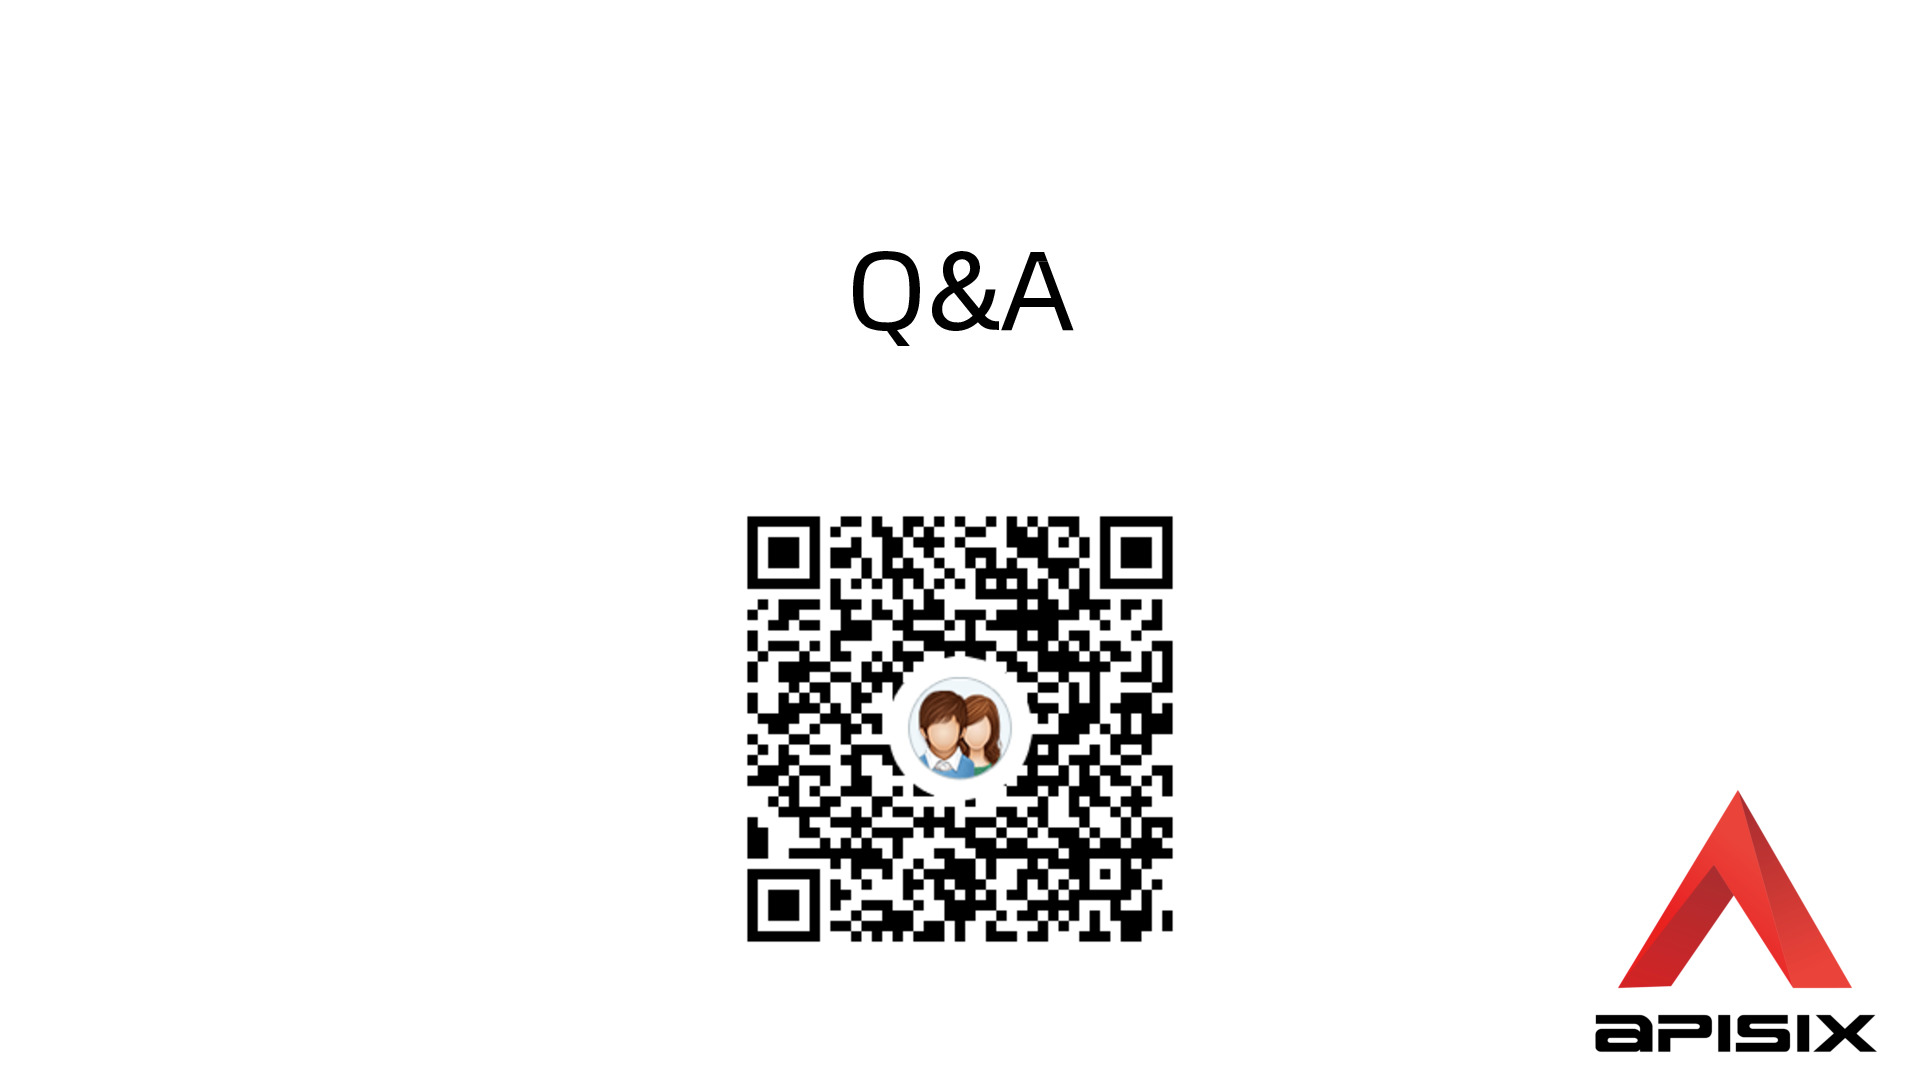 https://opentalk-blog.b0.upaiyun.com/prod/2019-12-18/a873ef4705006f1e1ef0db73f825531d